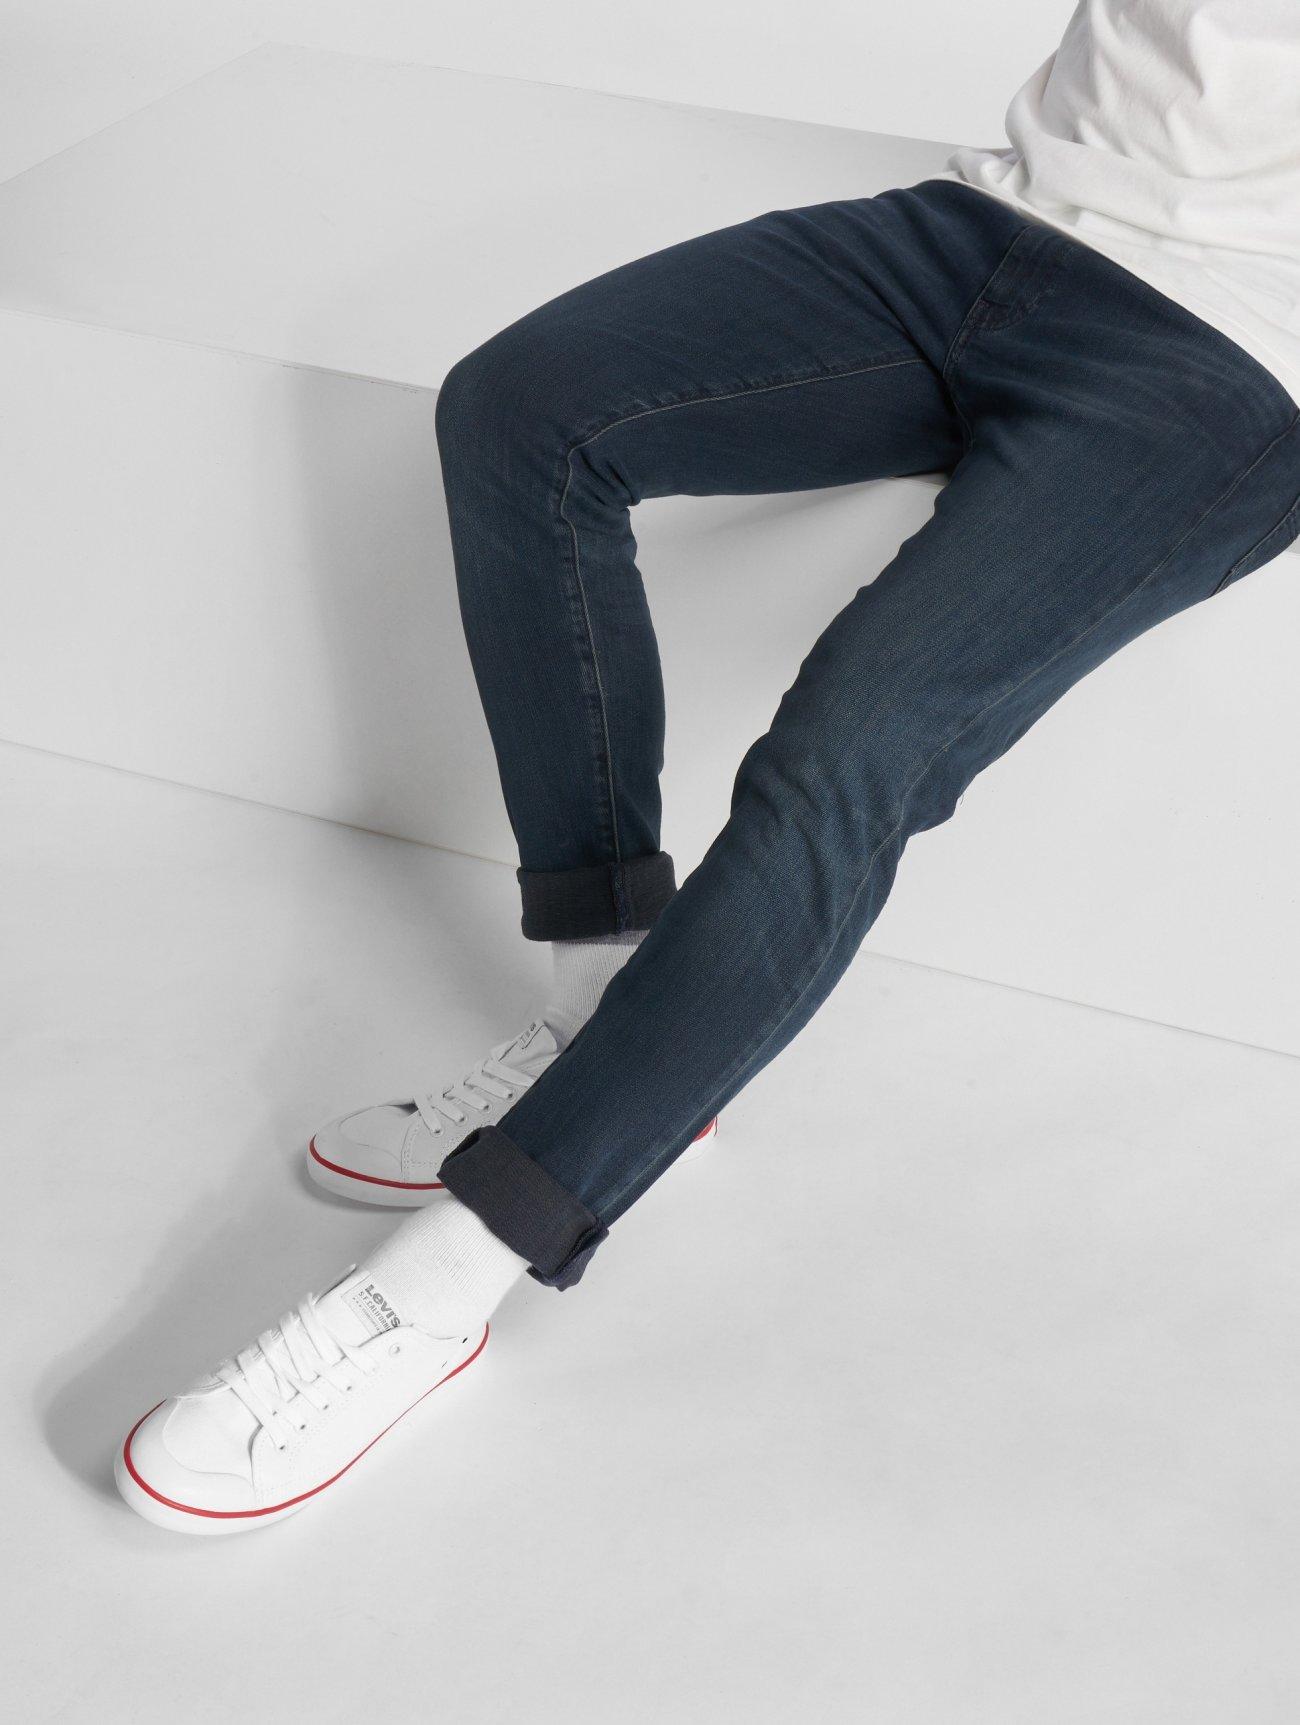 Levi's® 512 indigo Homme Jean slim 468774 Homme Jeans